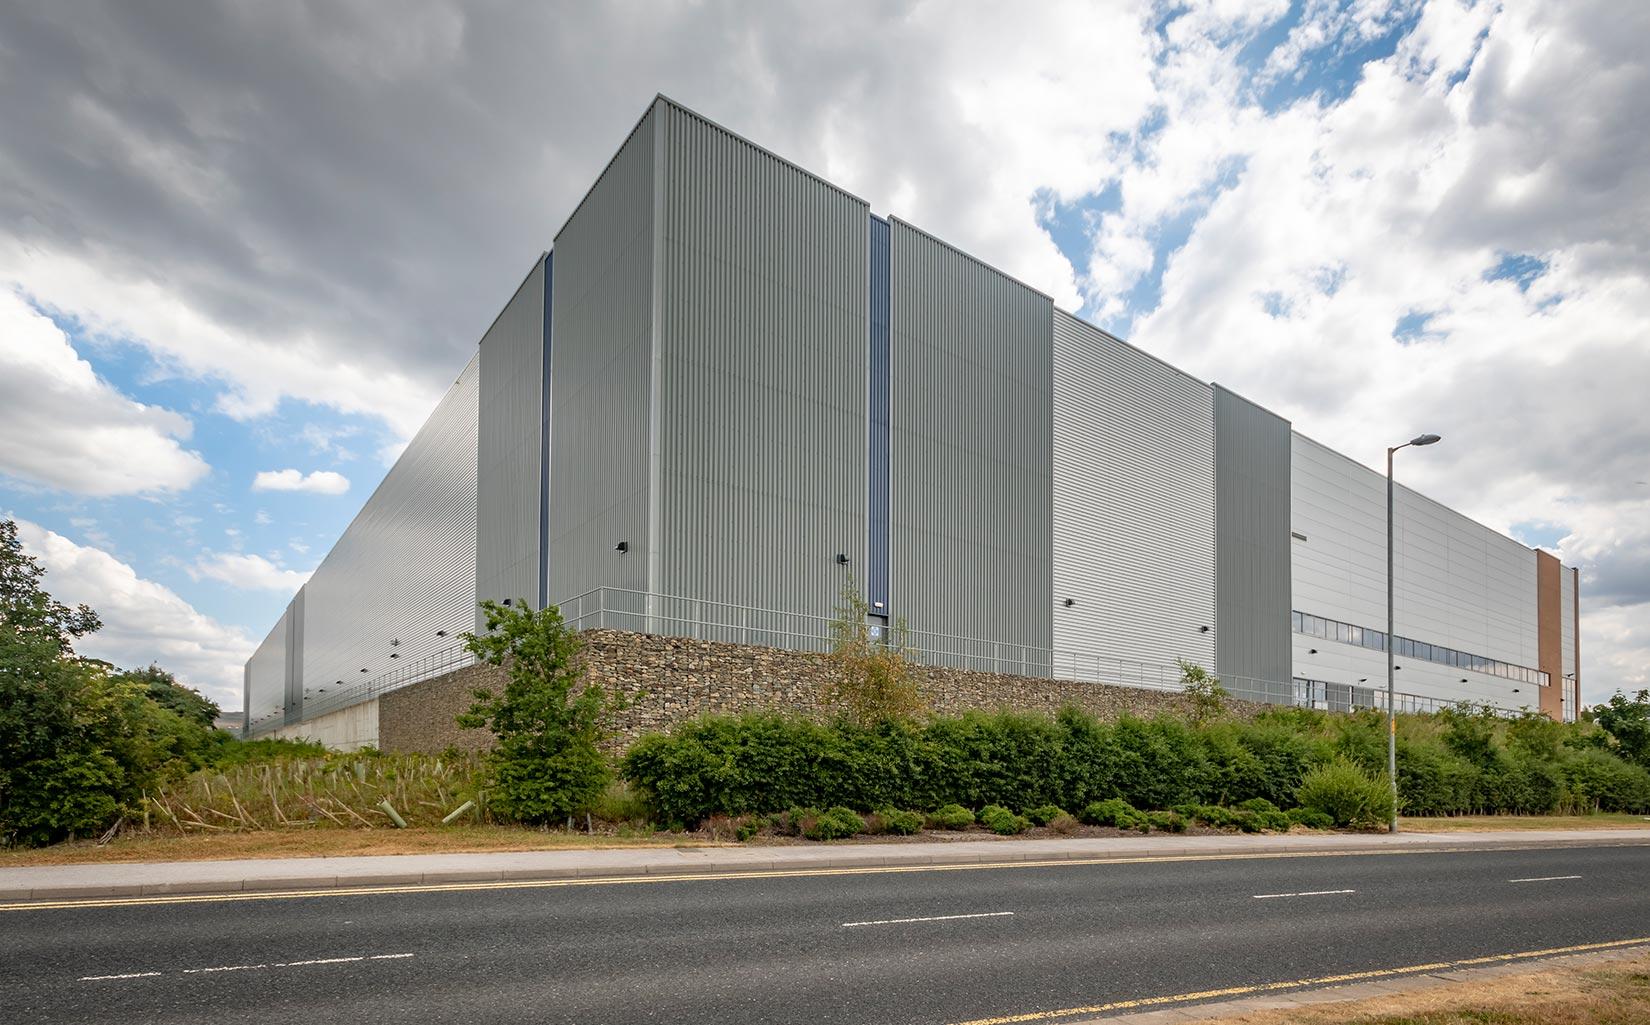 Kingsway Business Park, Milnrow, Rochdale, WCCTV Unit Approach